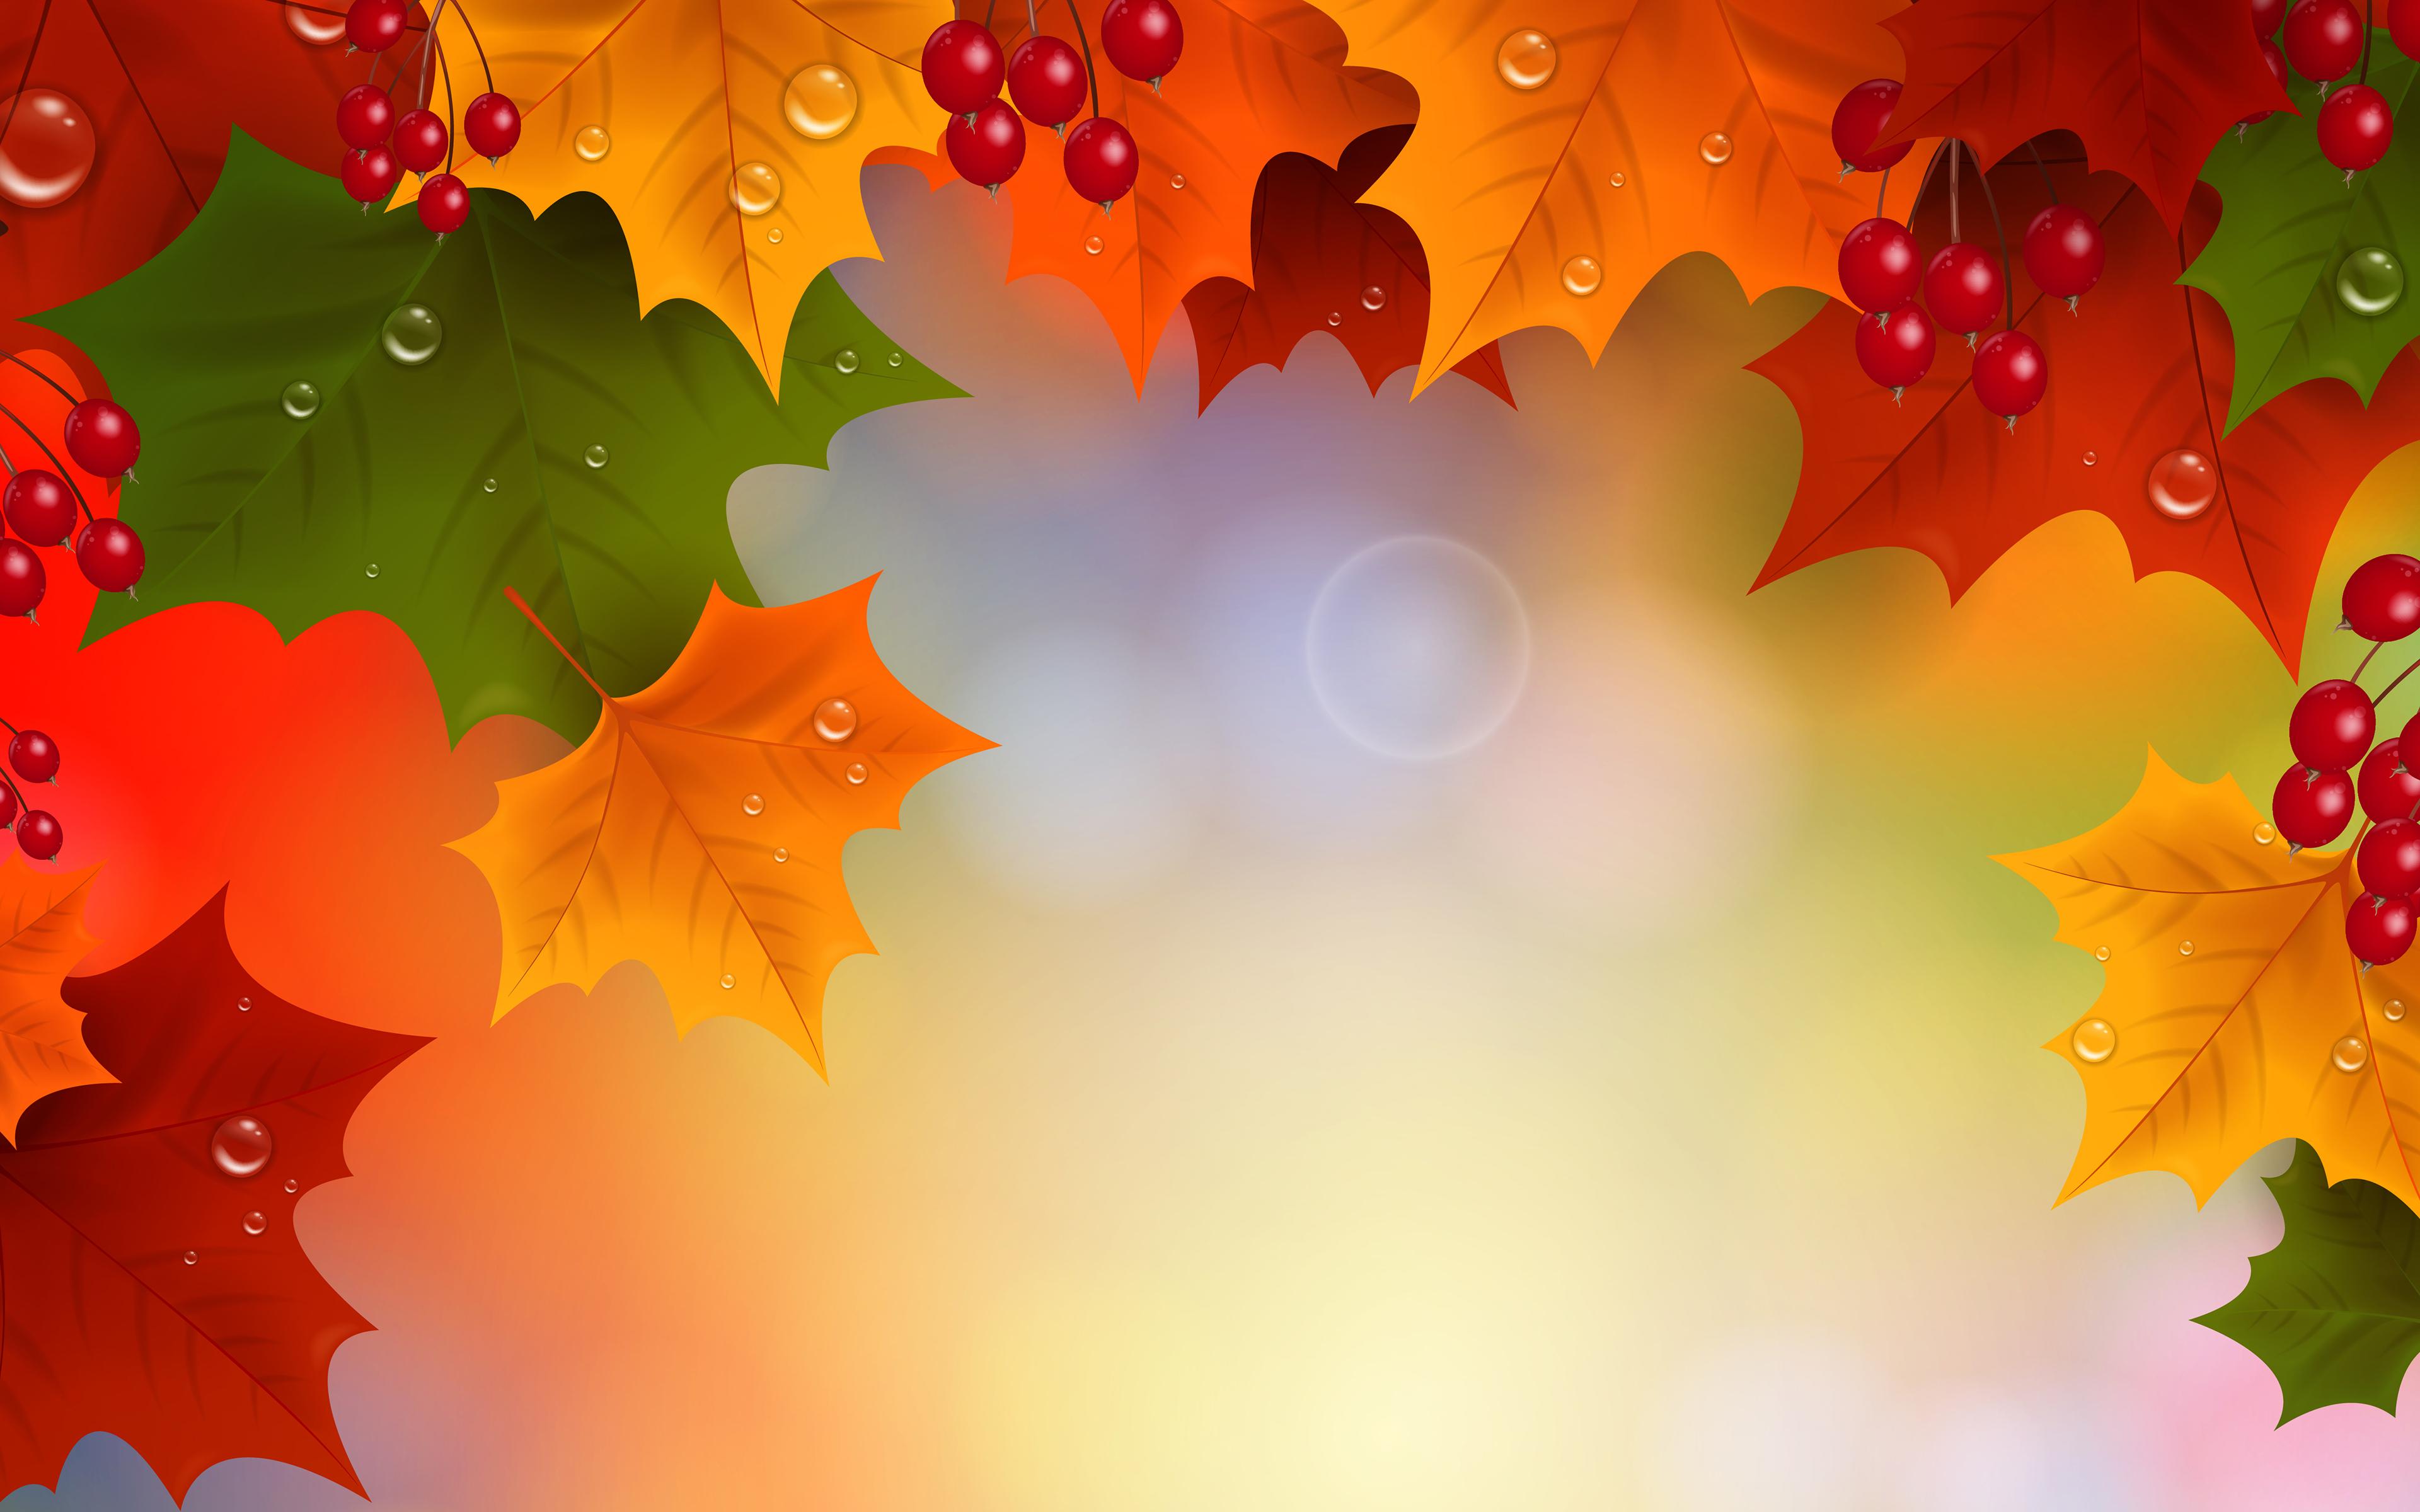 Осень фон картинка